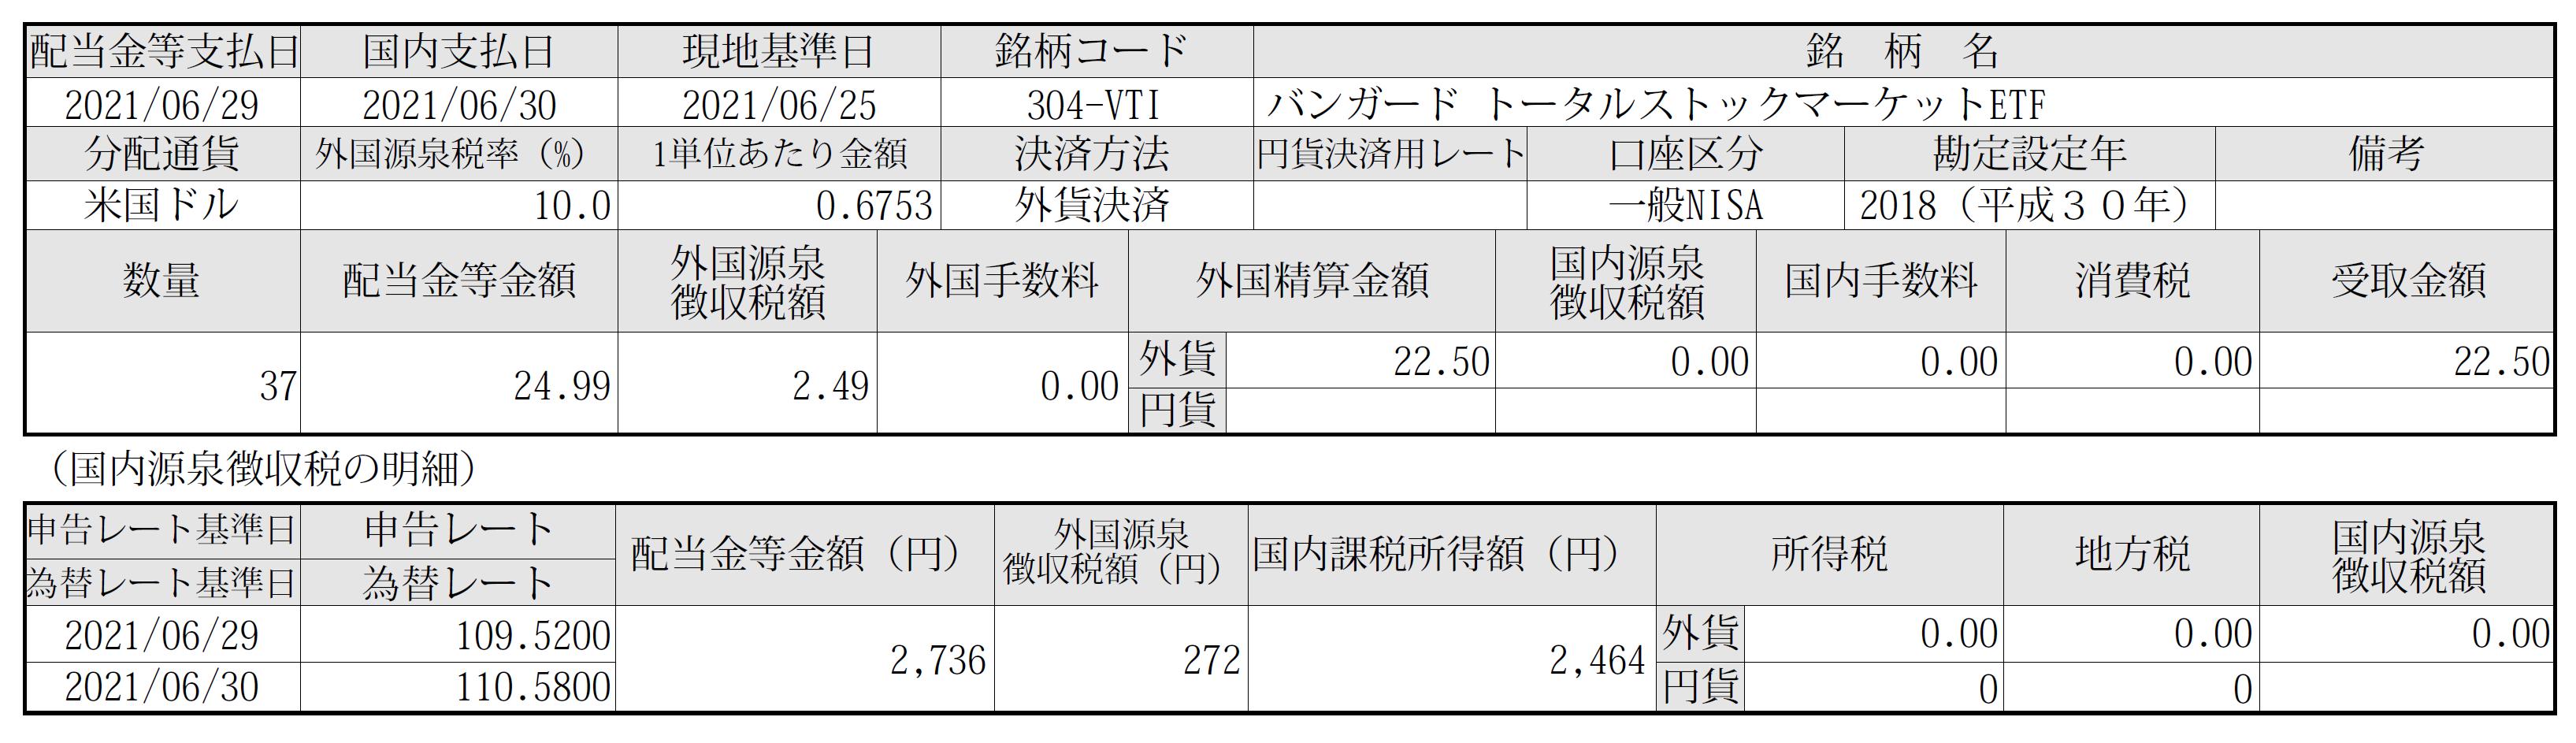 f:id:hodo-work:20210706193323p:plain